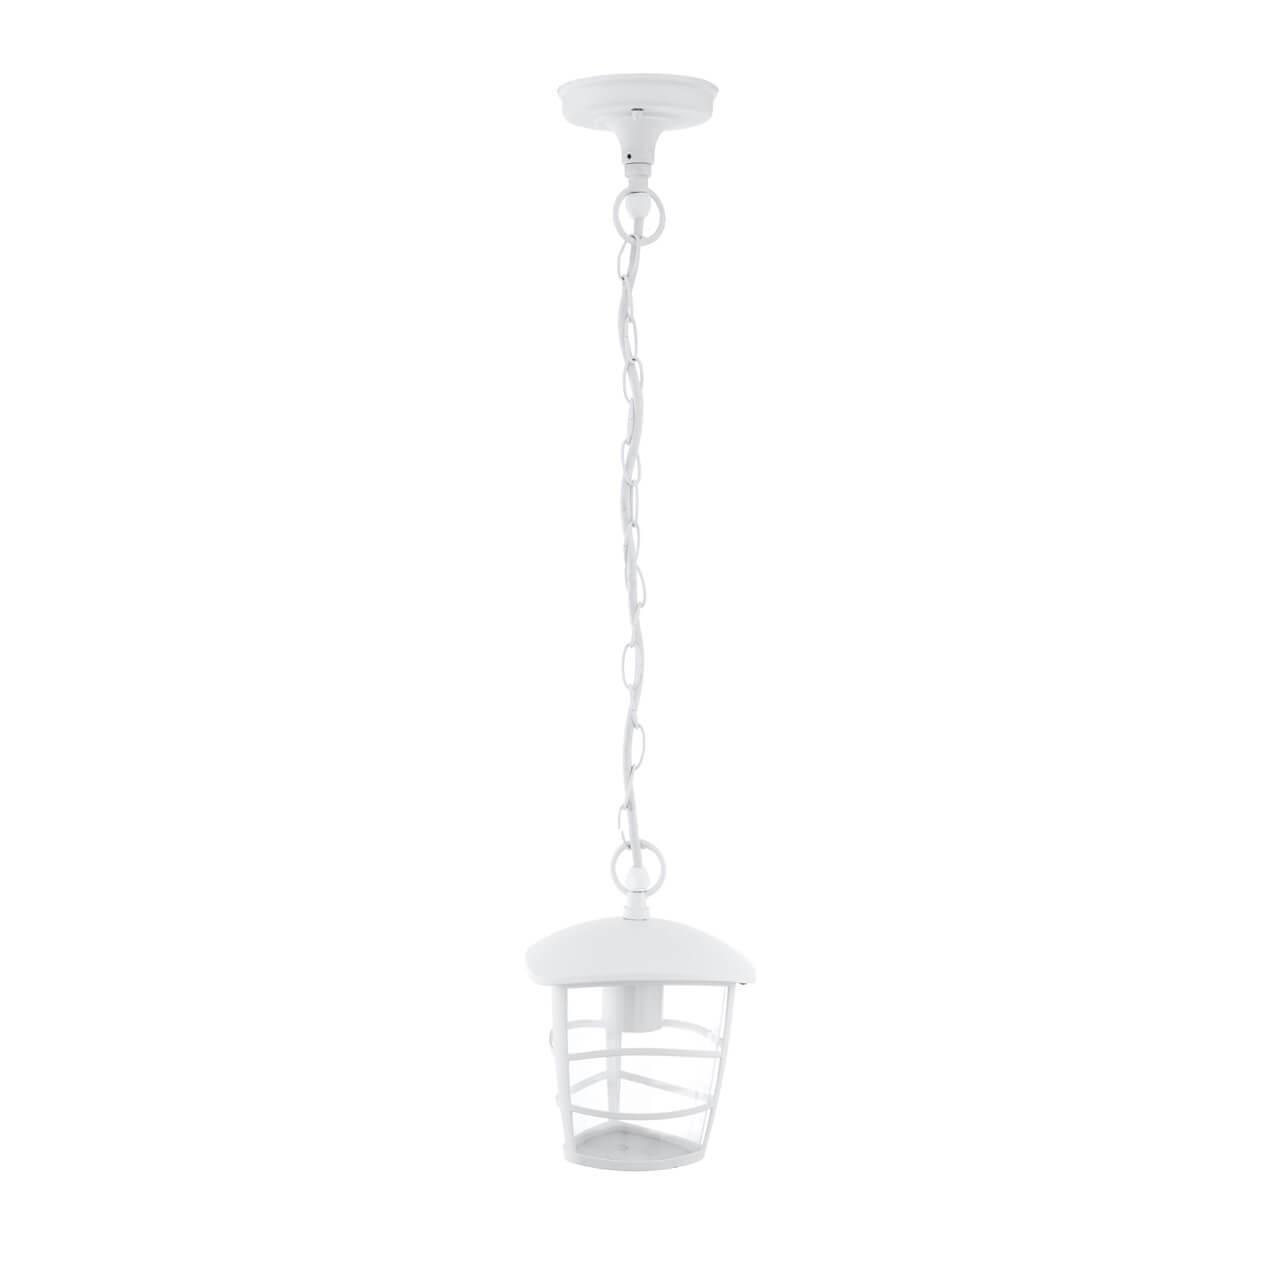 Уличный светильник Eglo 93402, E27 цены